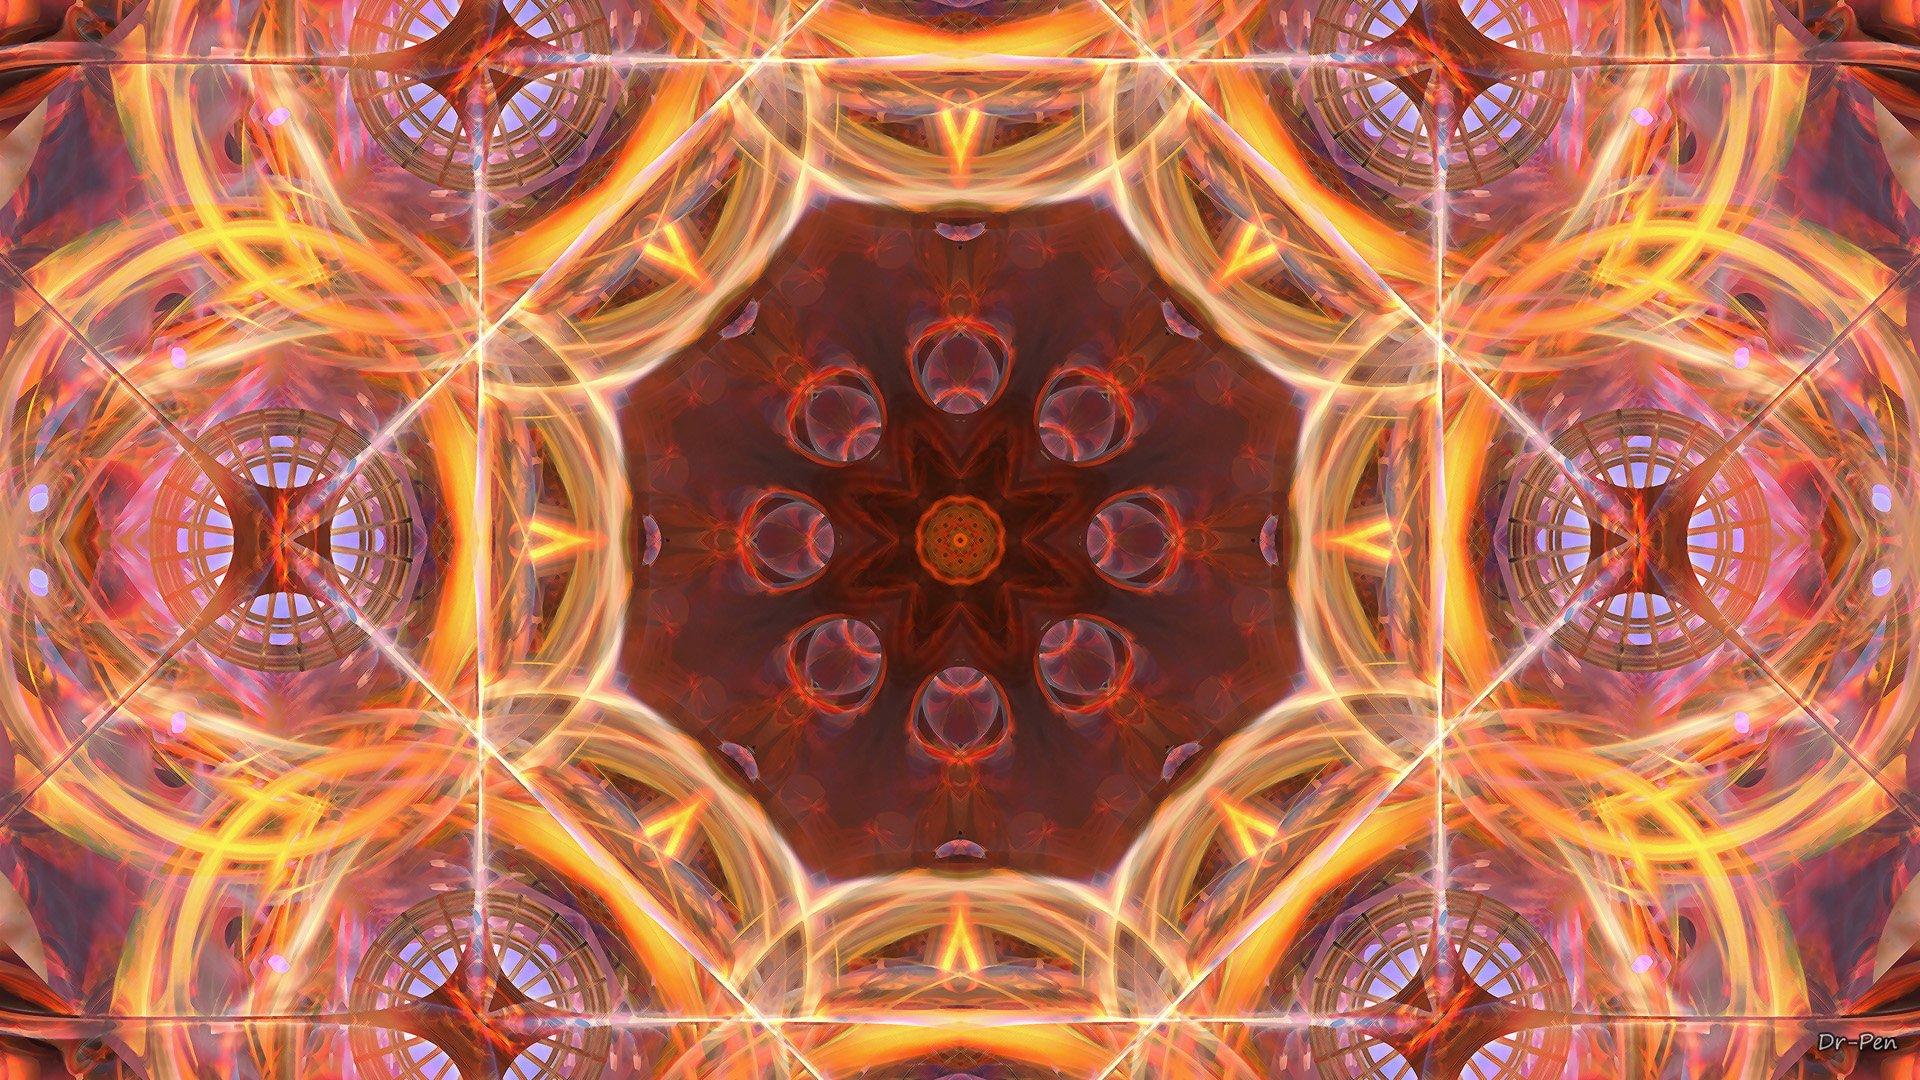 Abstract - Pattern  Abstract Artistic Digital Art Mandala Manipulation Wallpaper